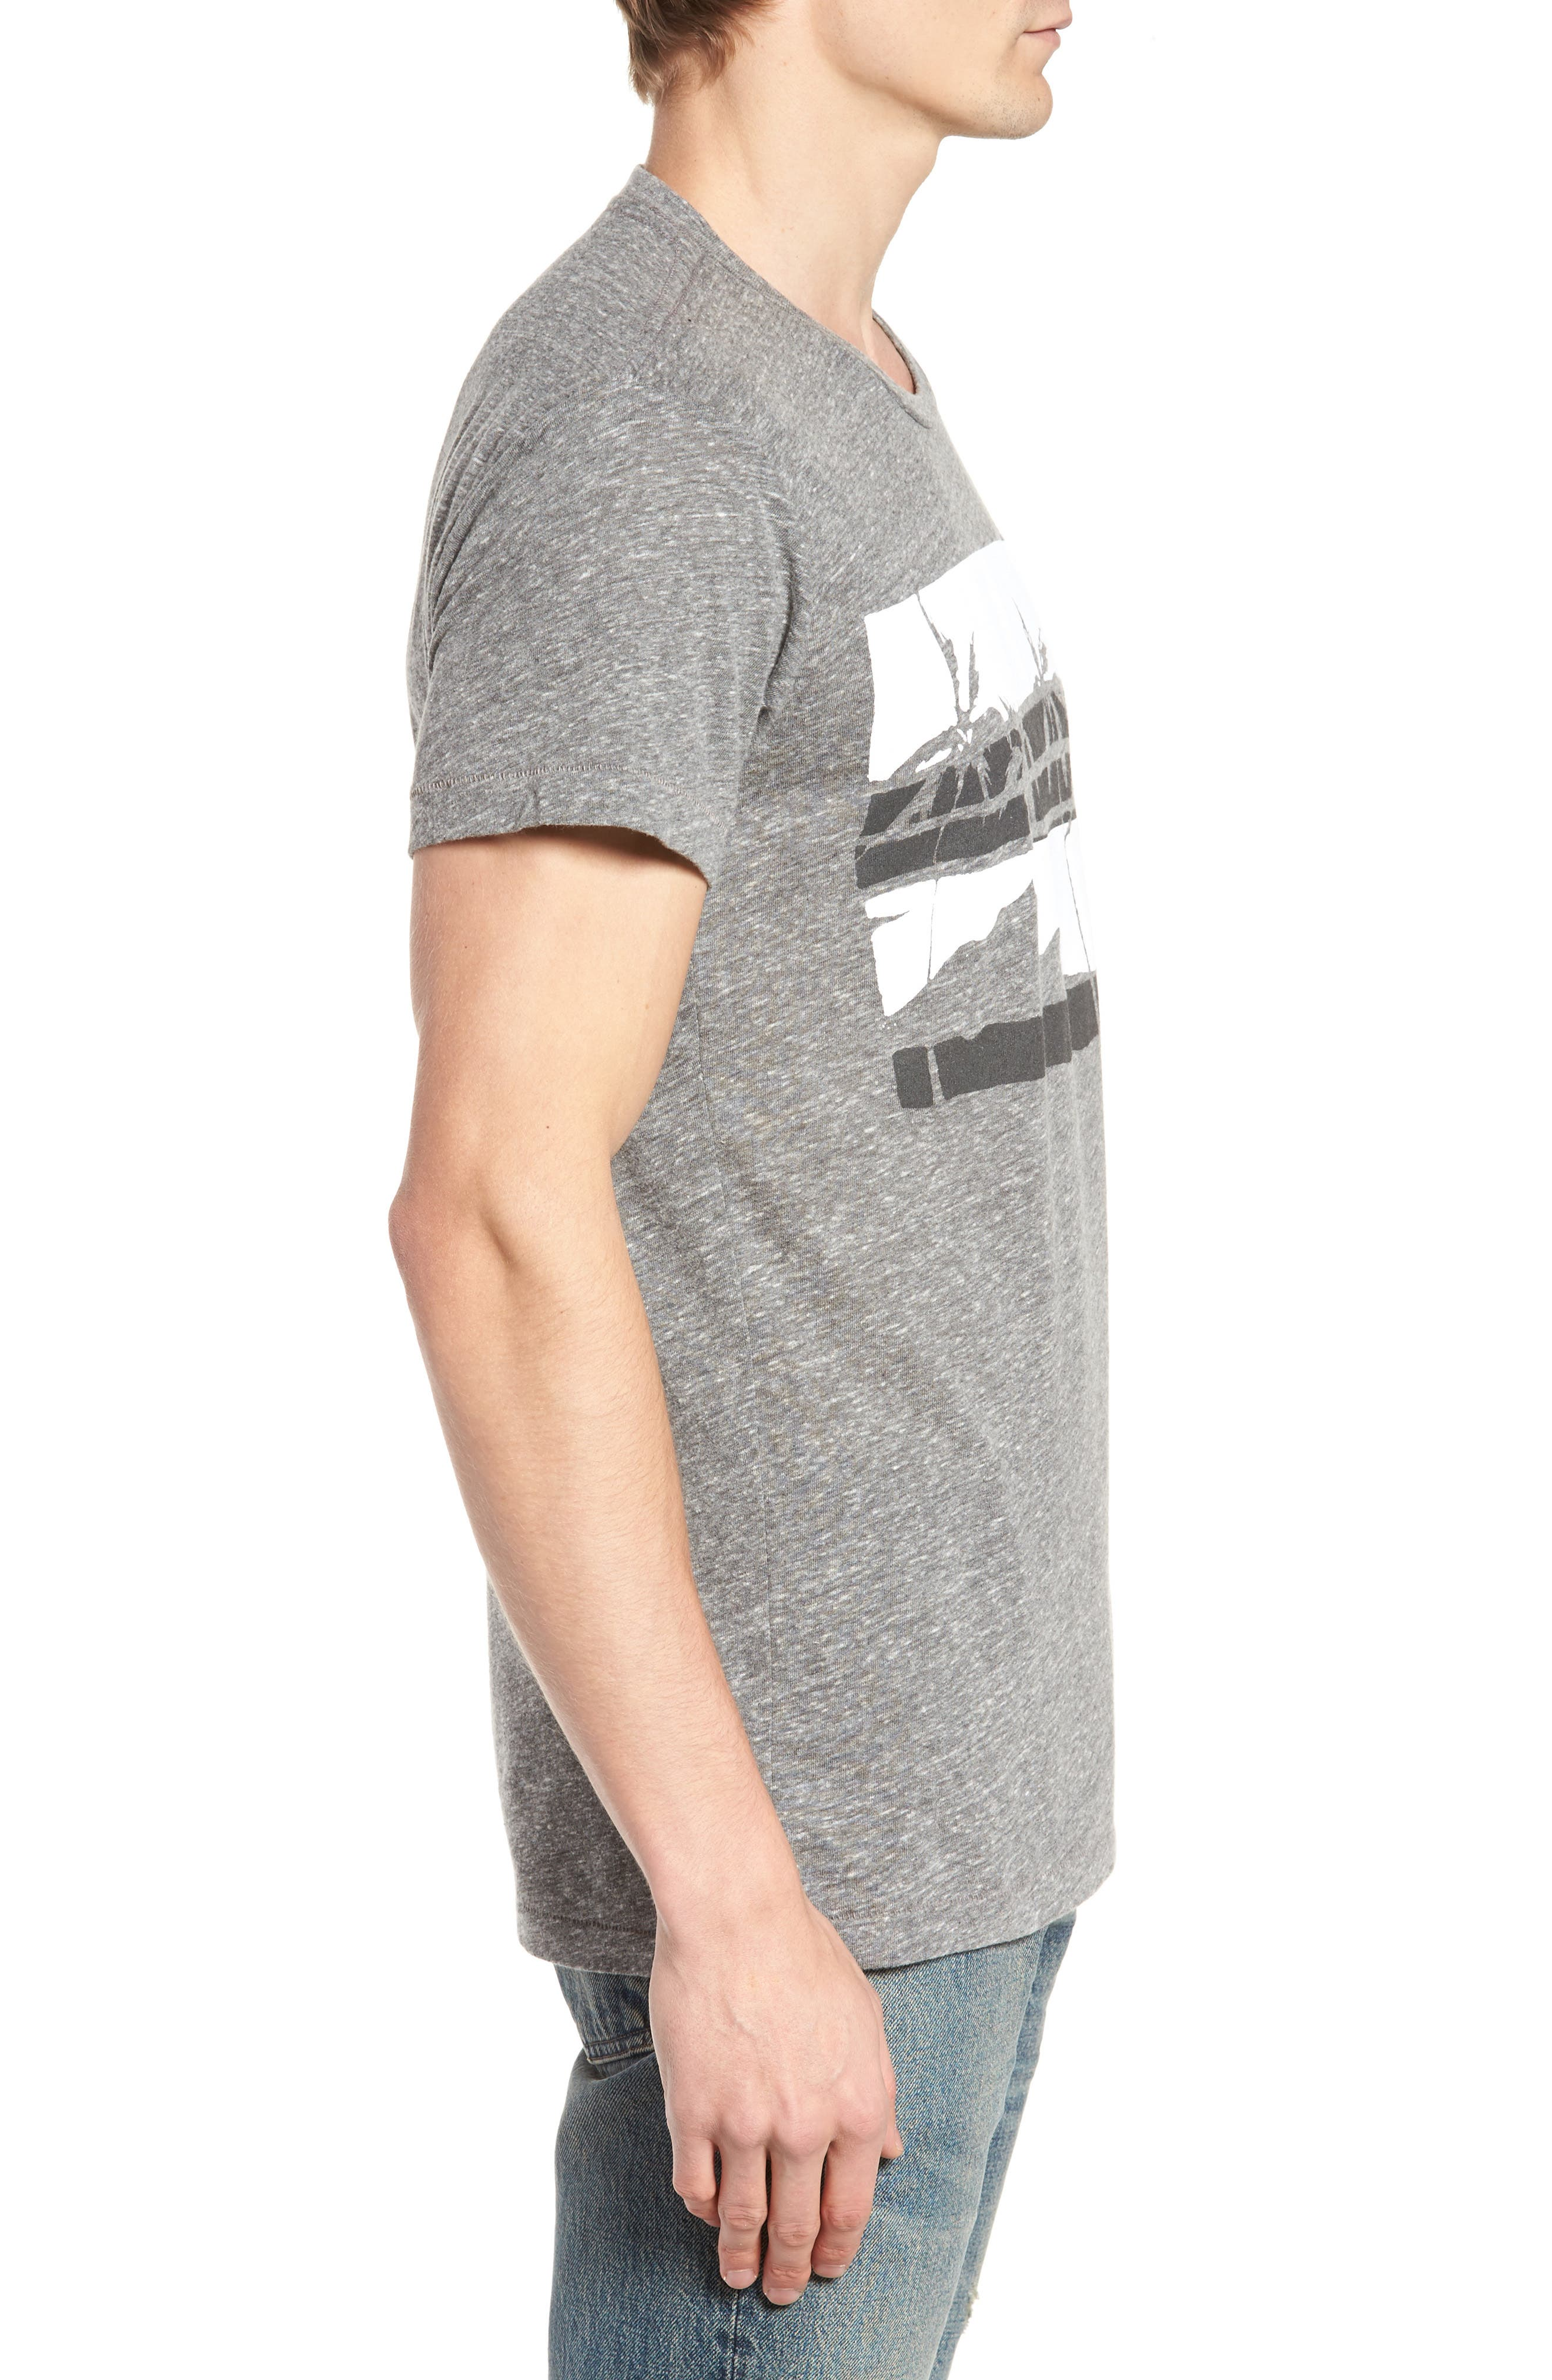 Las Palmas T-Shirt,                             Alternate thumbnail 3, color,                             060